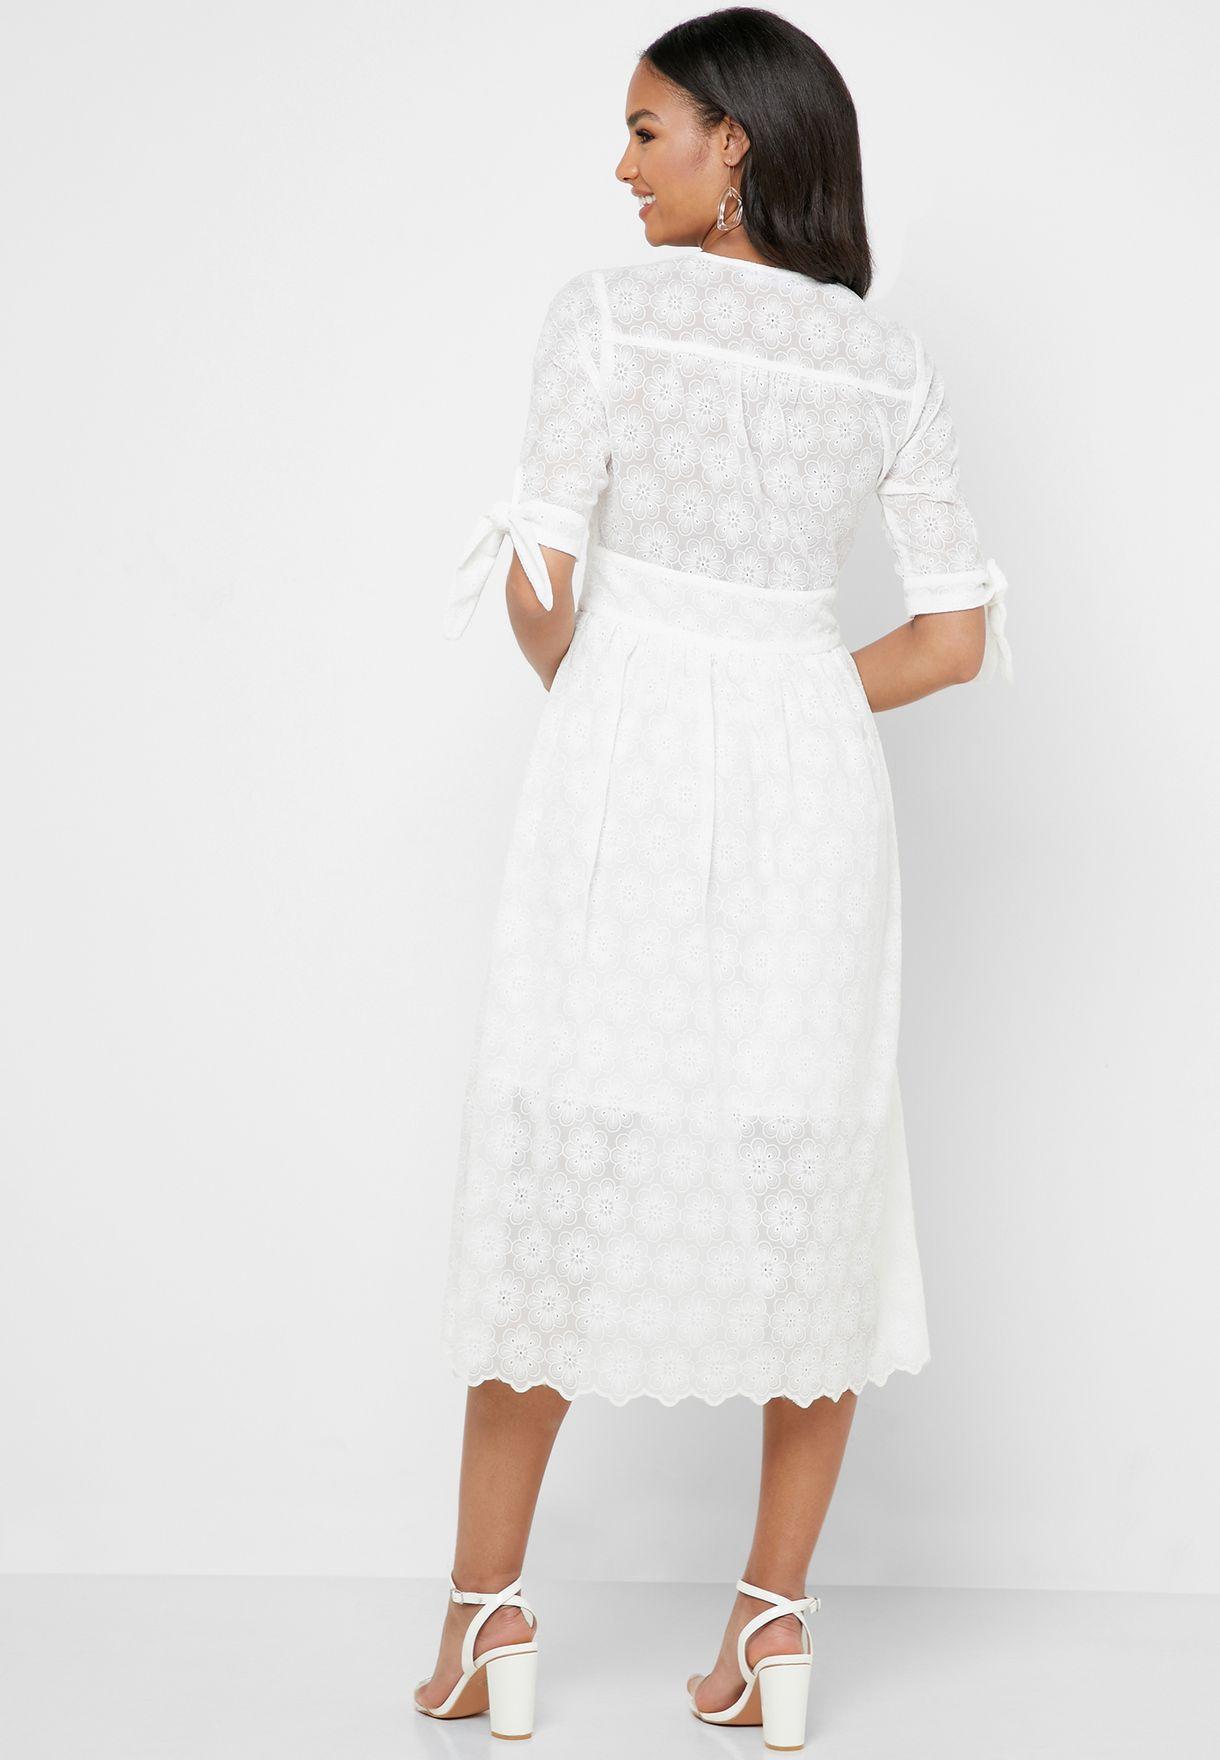 Tie Sleeve Lace Detail Dress